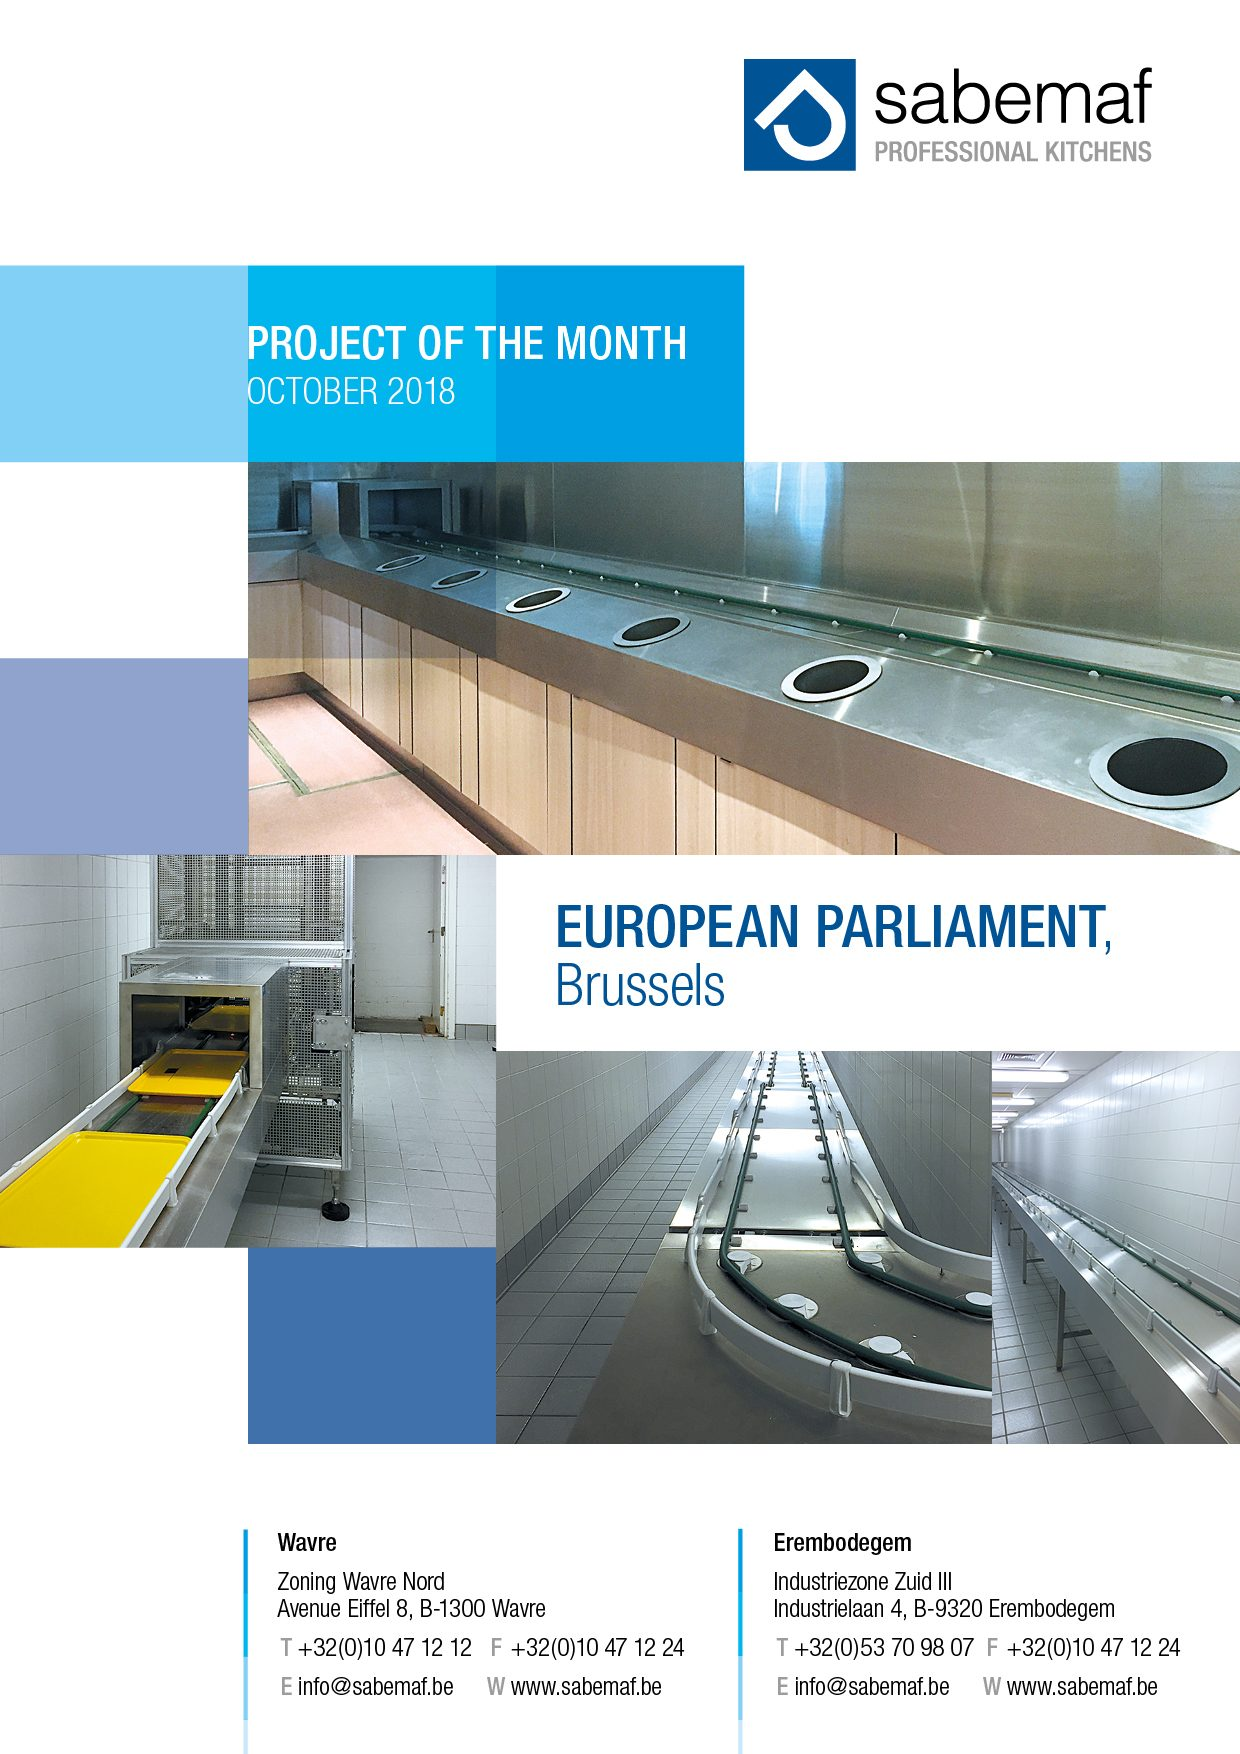 POM Oct 18 - European Parliament